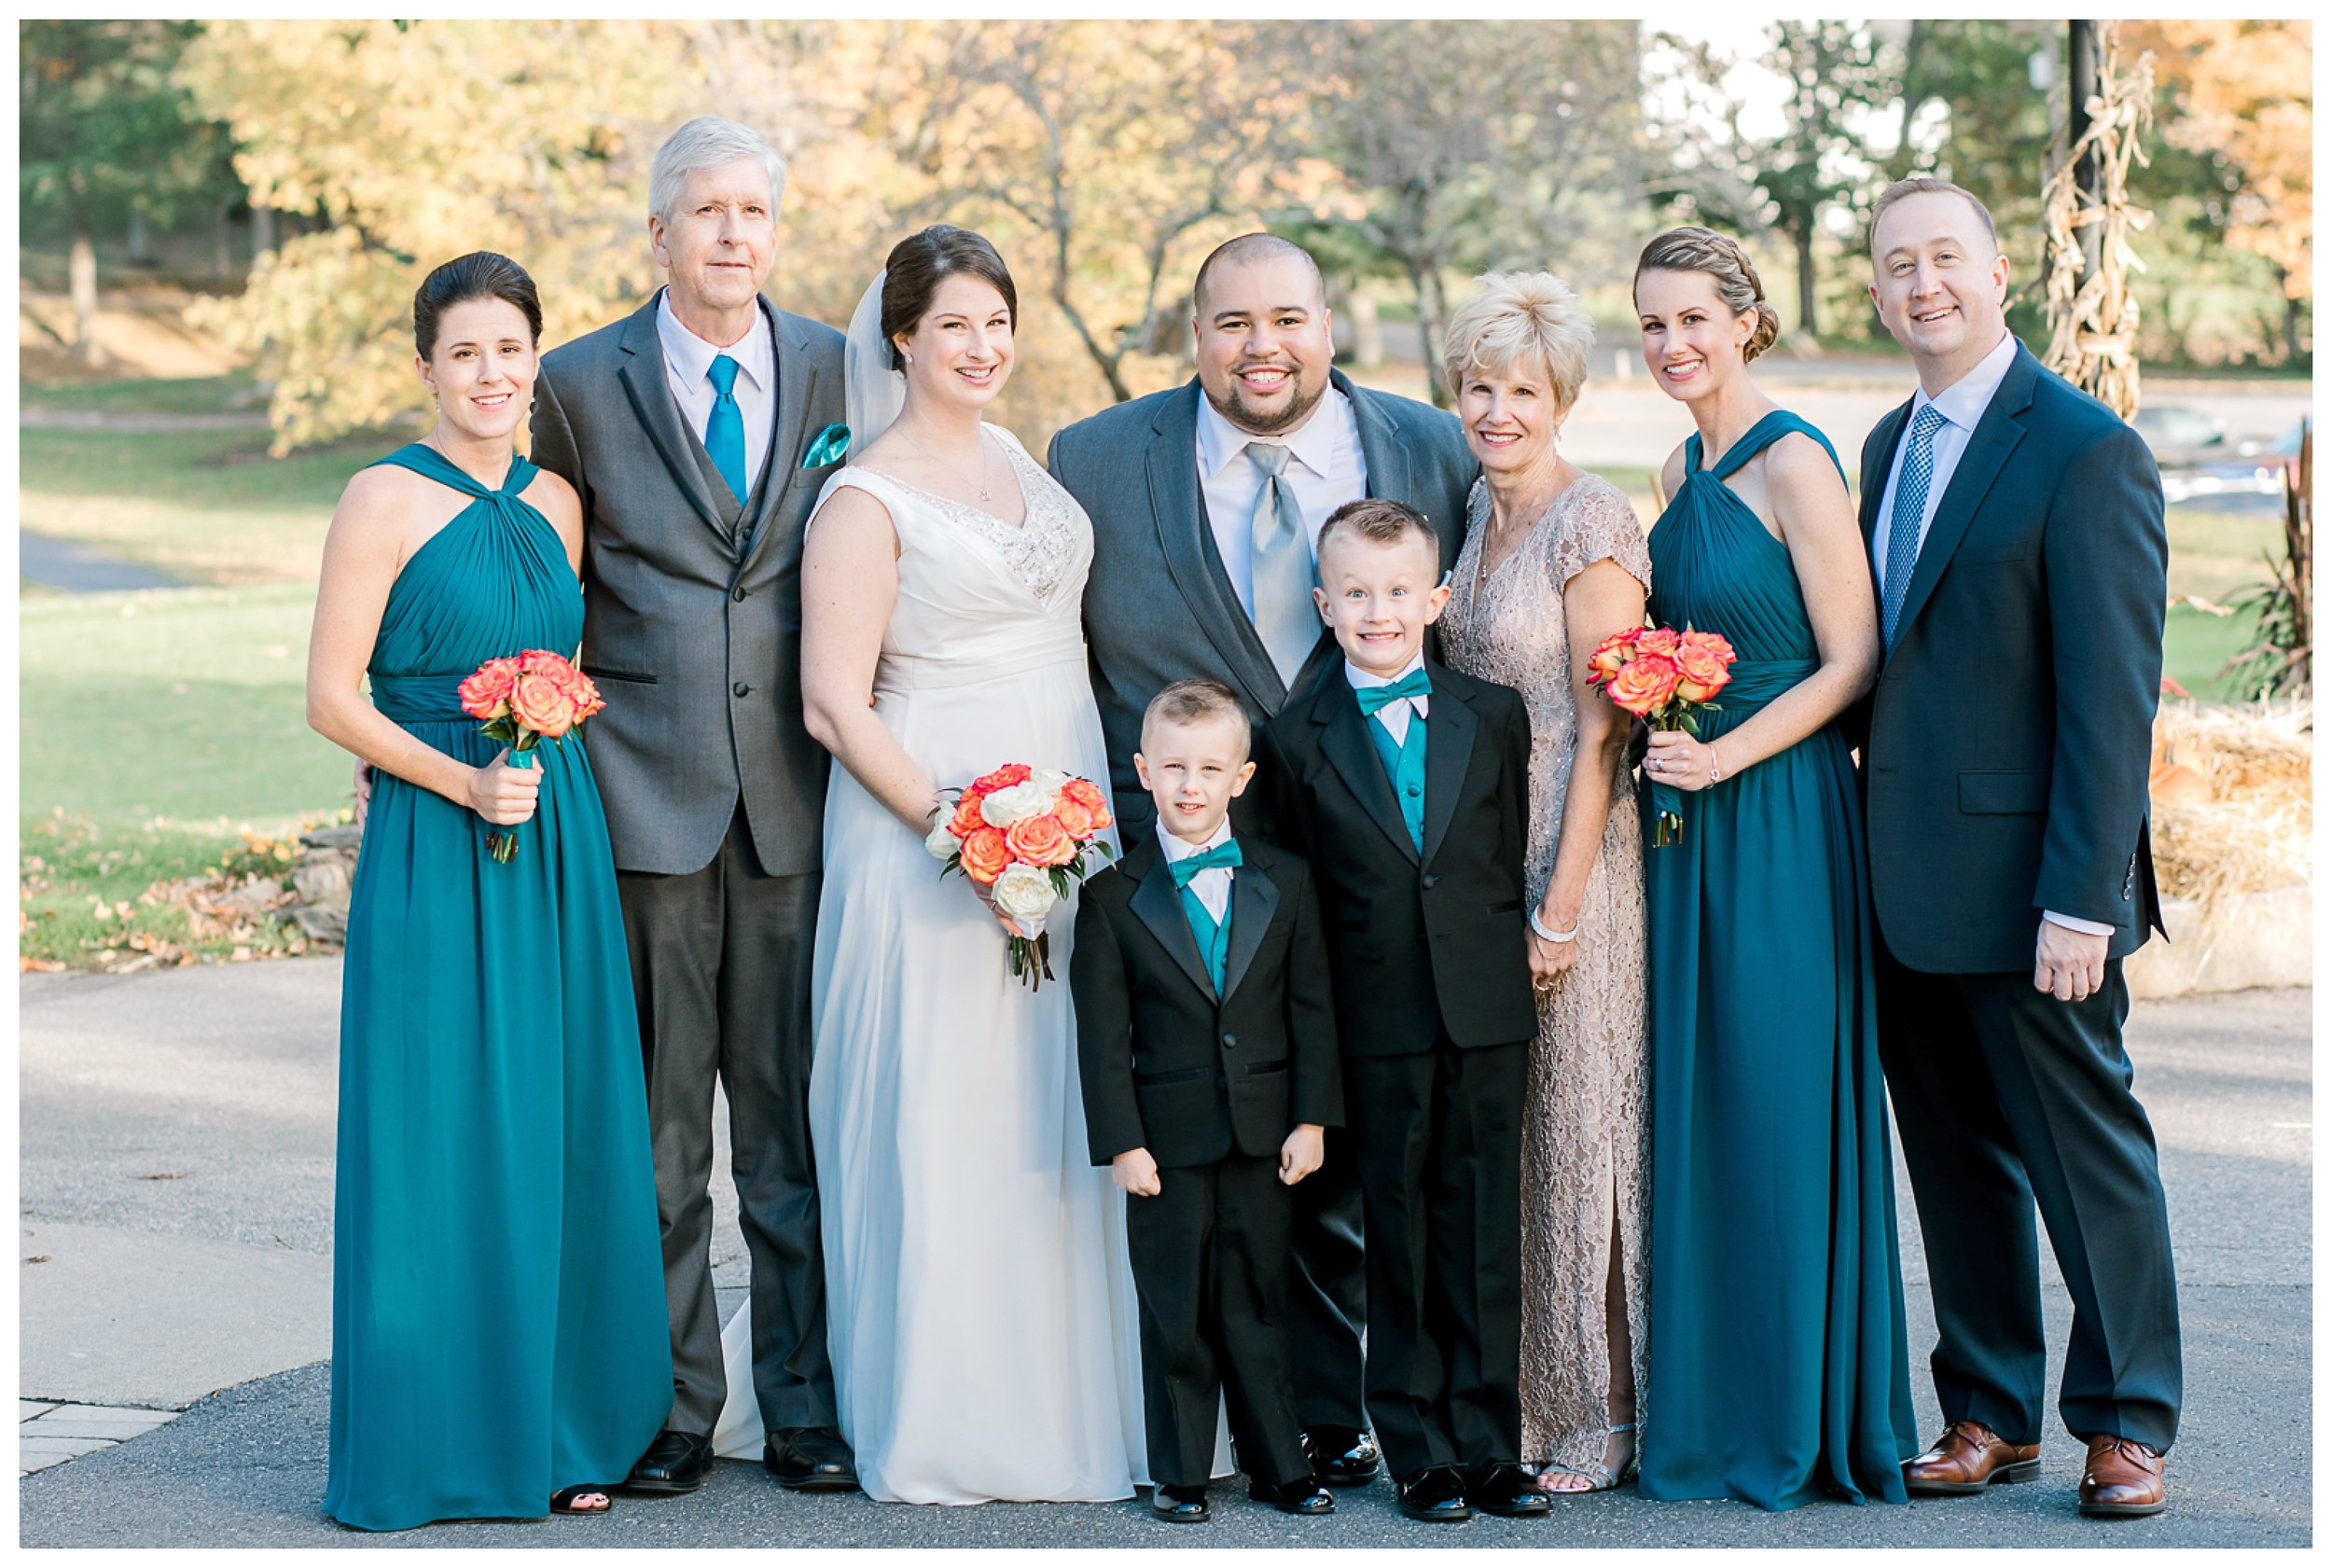 pleasant_valley_country_club_wedding_sutton_erica_pezente_photography (40).jpg